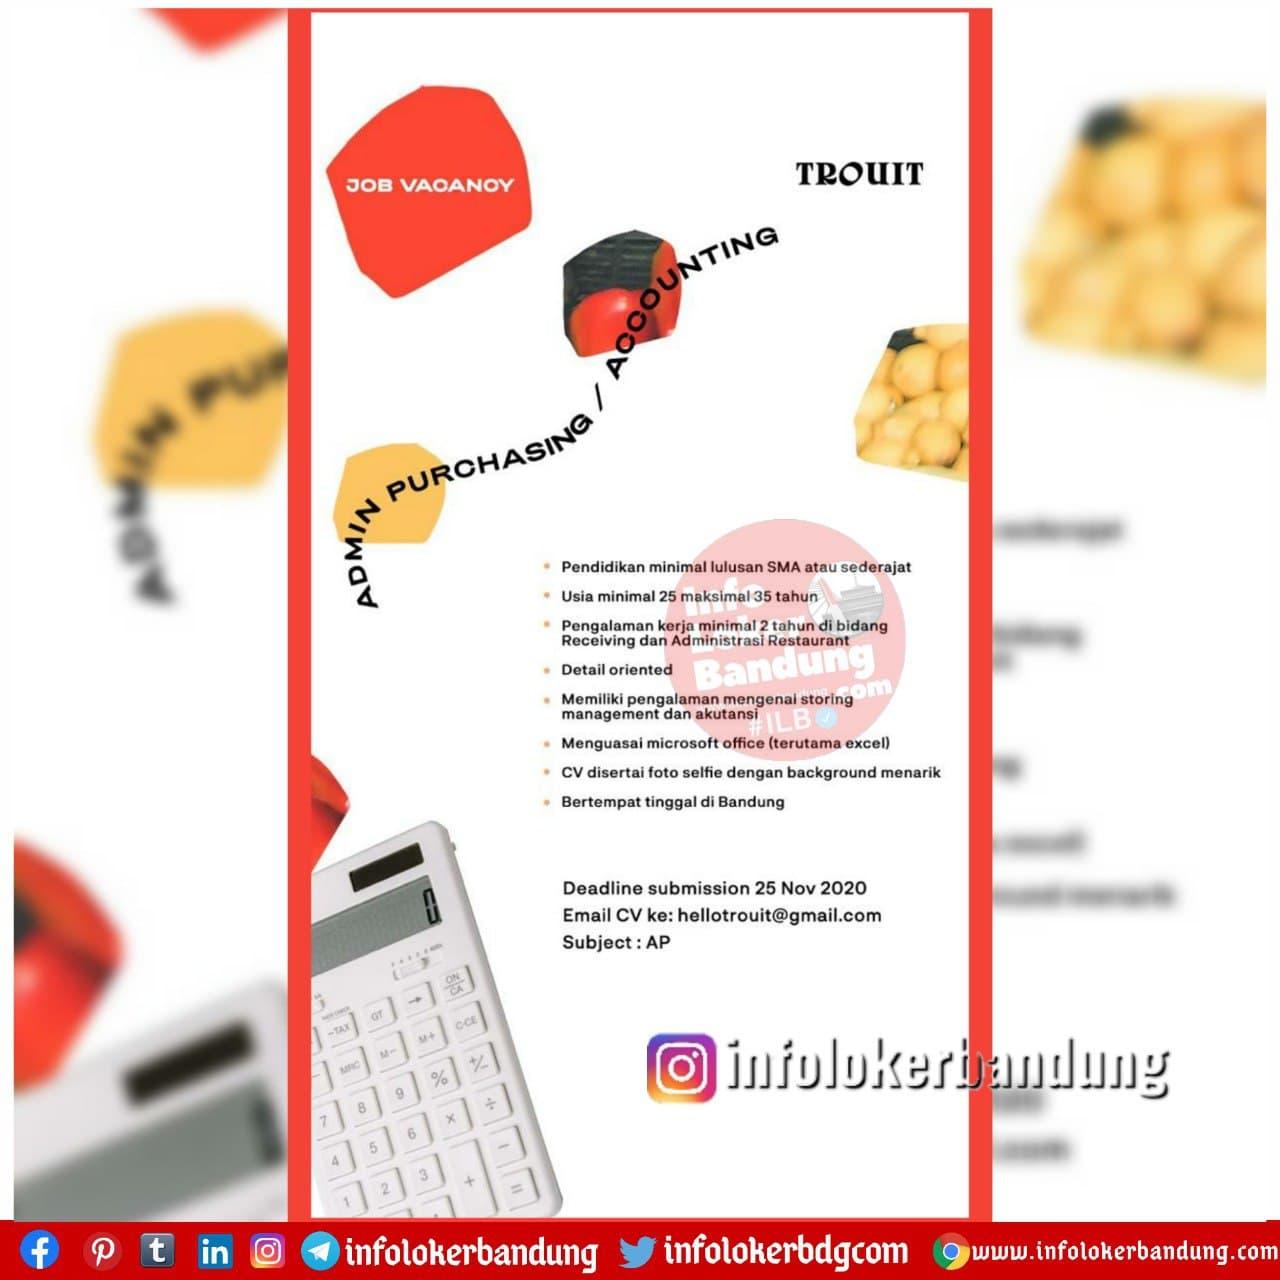 Lowongan Kerja Trouit Restaurant Bandung November 2020